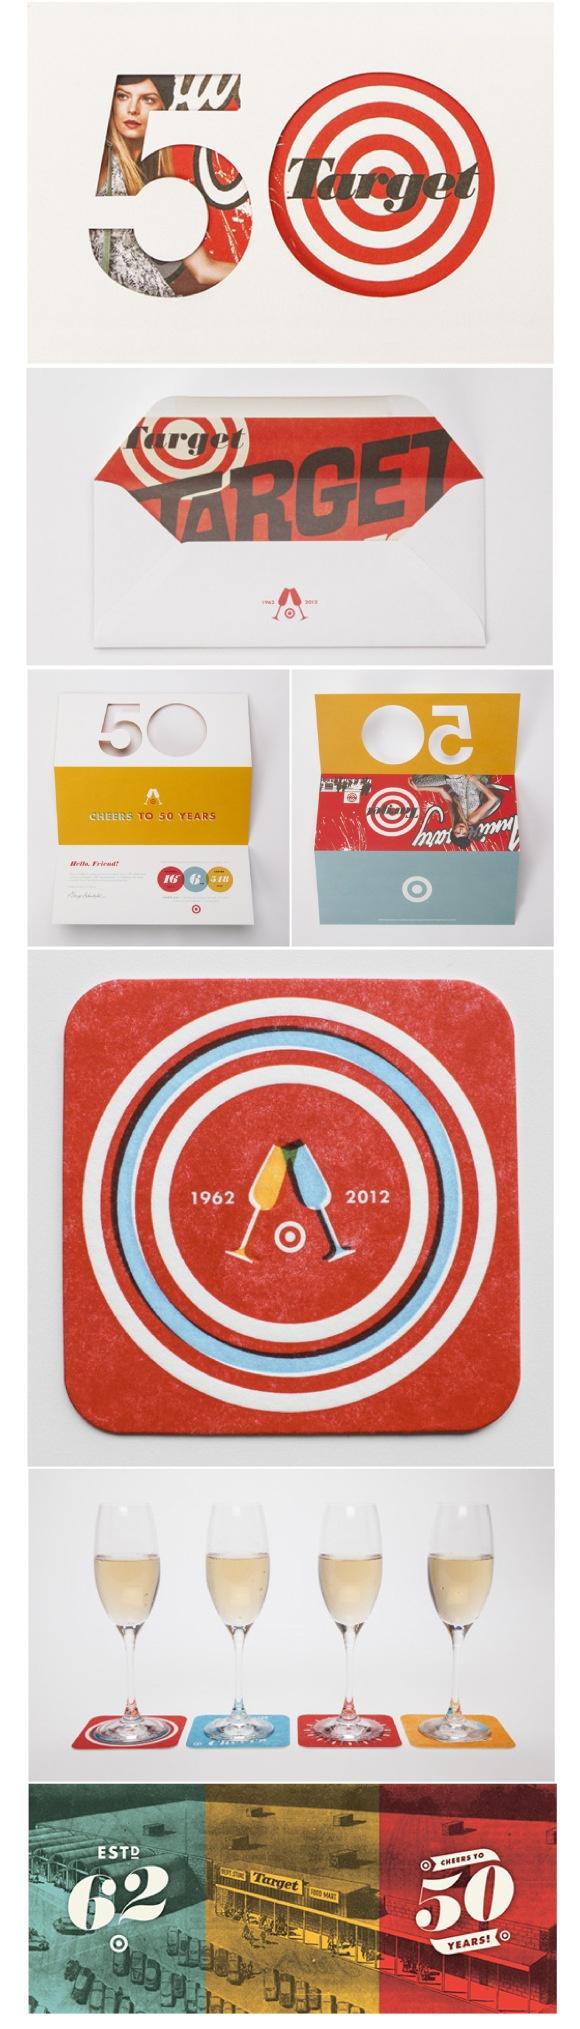 target 50th anniversary